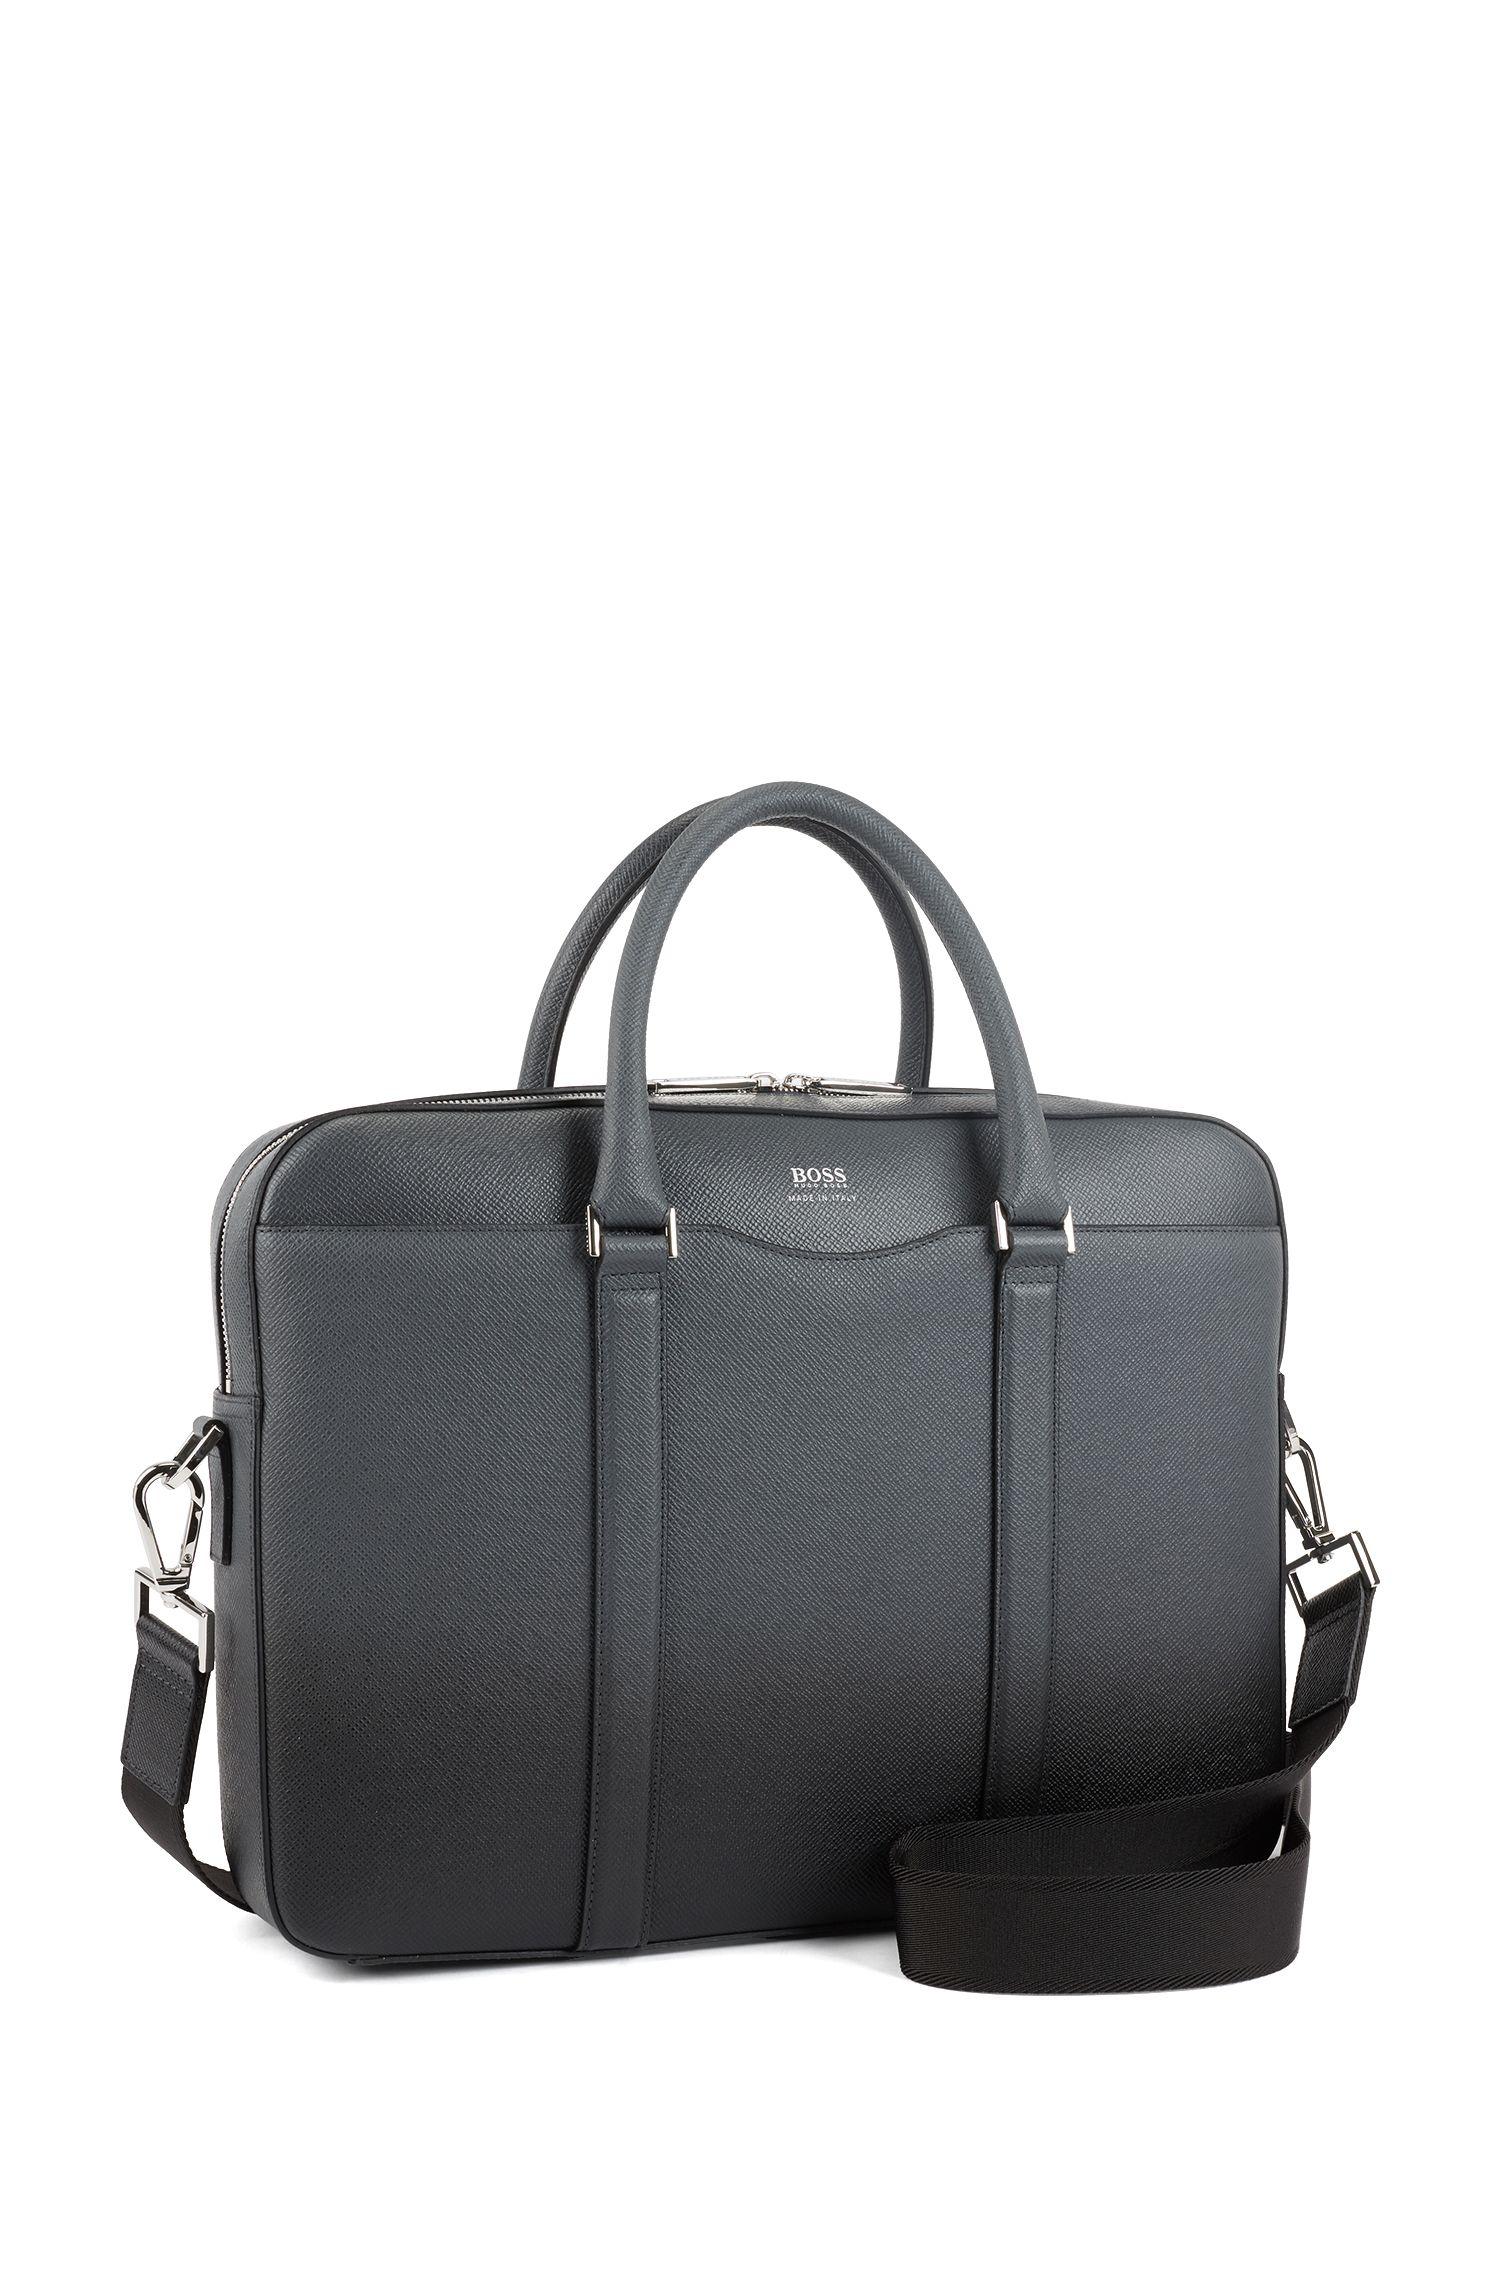 Signature Collection bag in dégradé palmellato leather, Charcoal